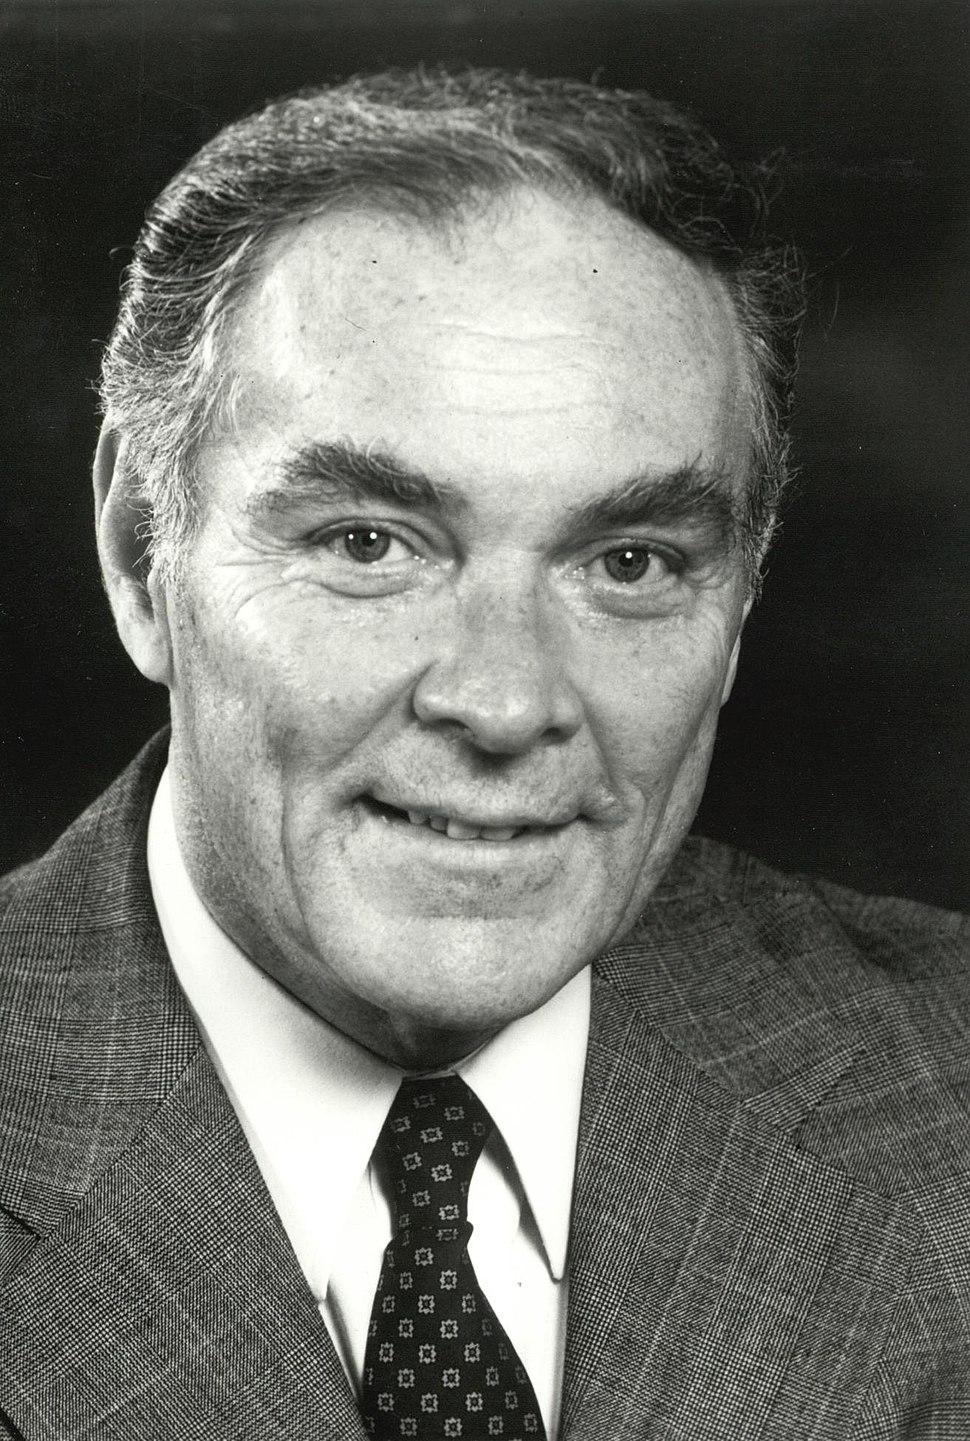 Secretary of State Alexander Haig